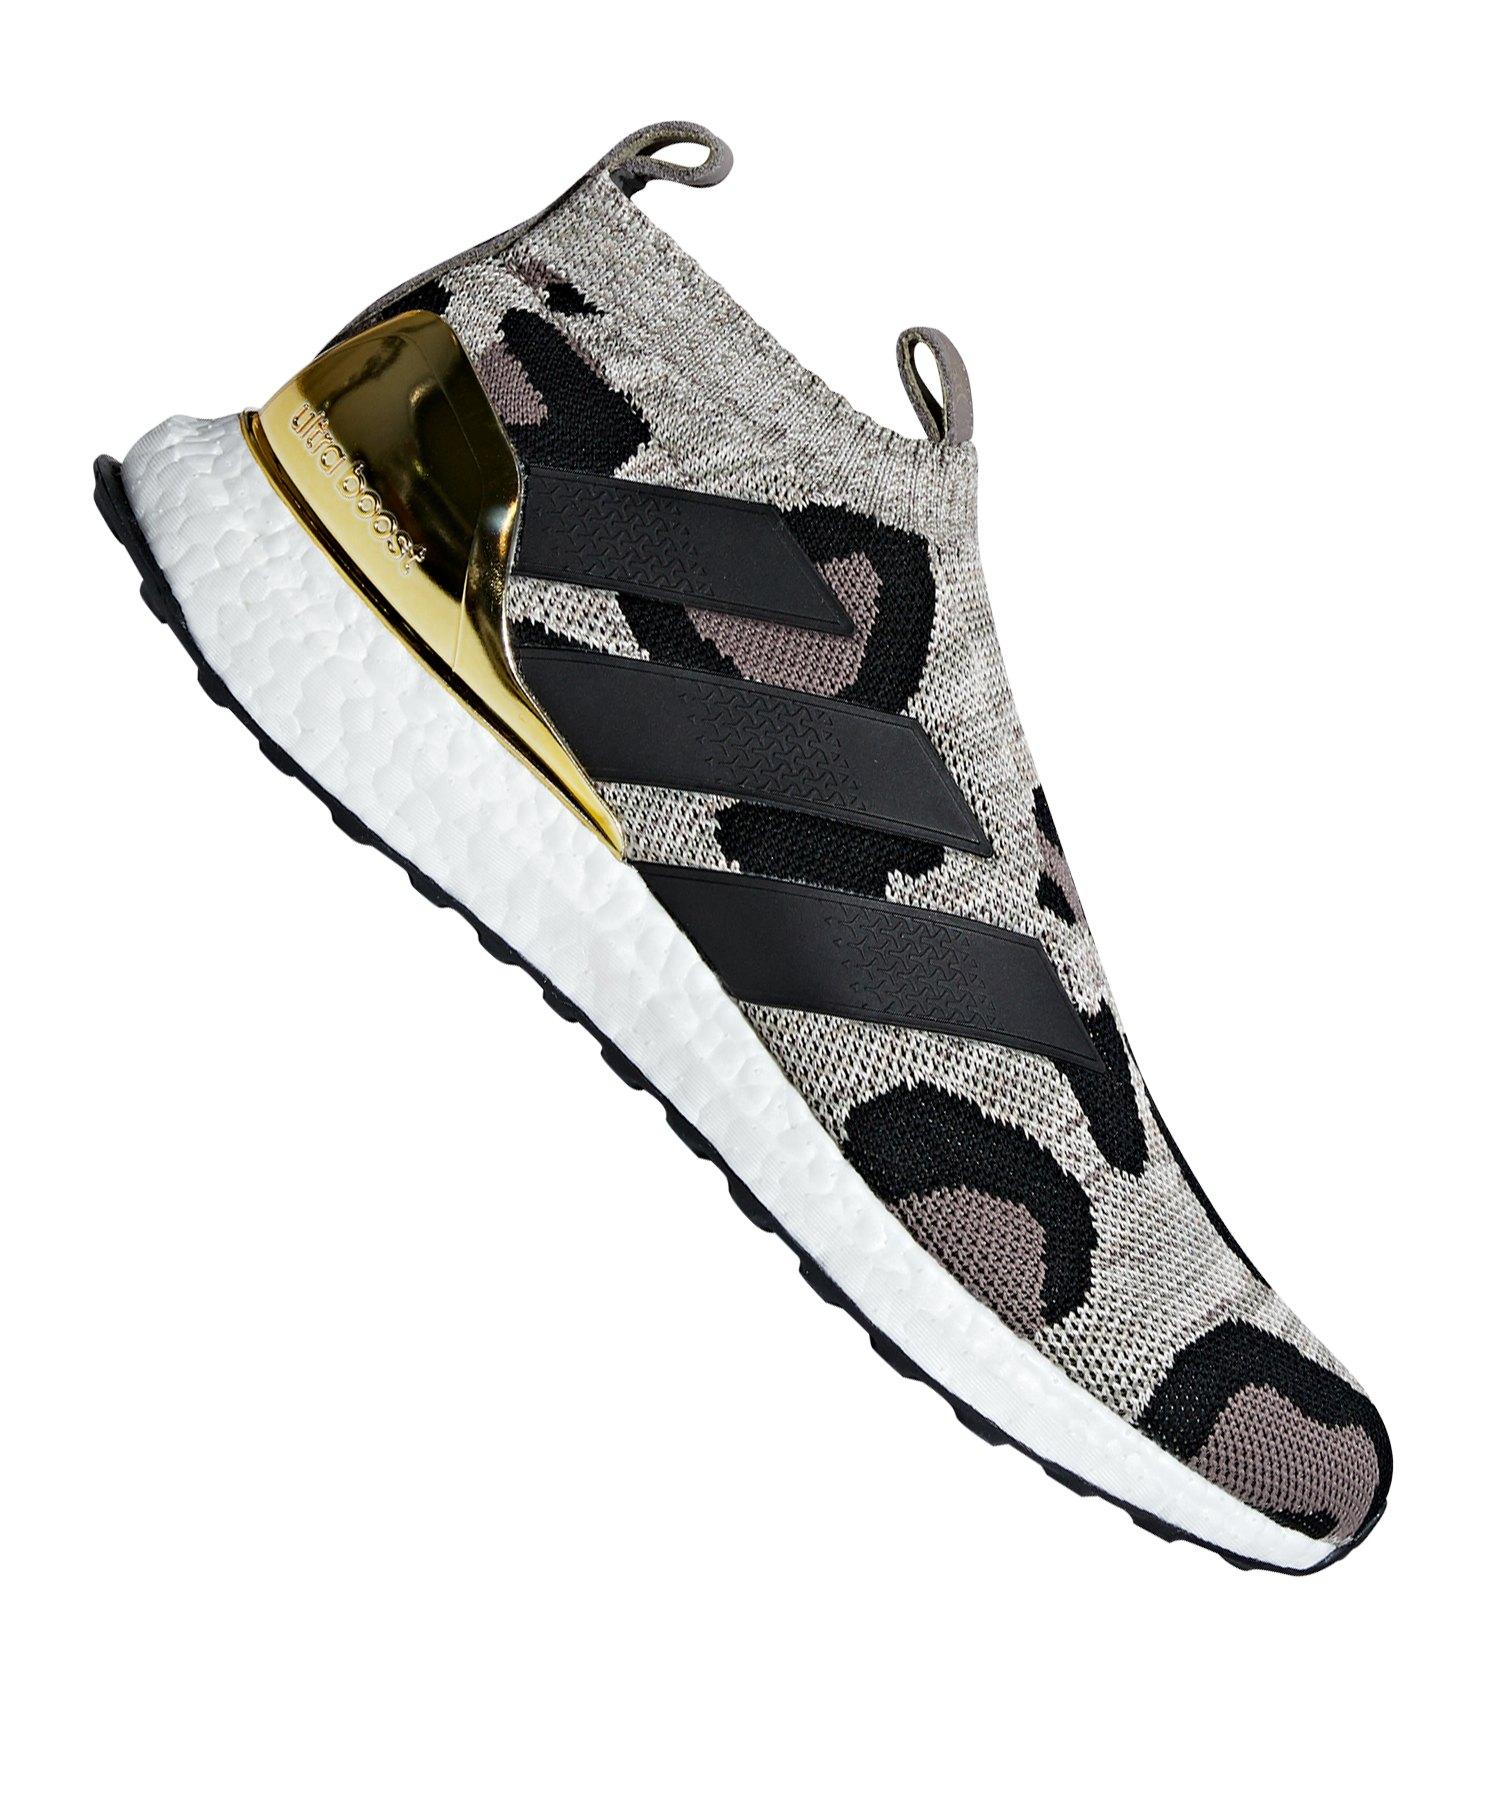 schuh schuh jogging braun braun adidas schuh adidas adidas jogging KFl31TJc